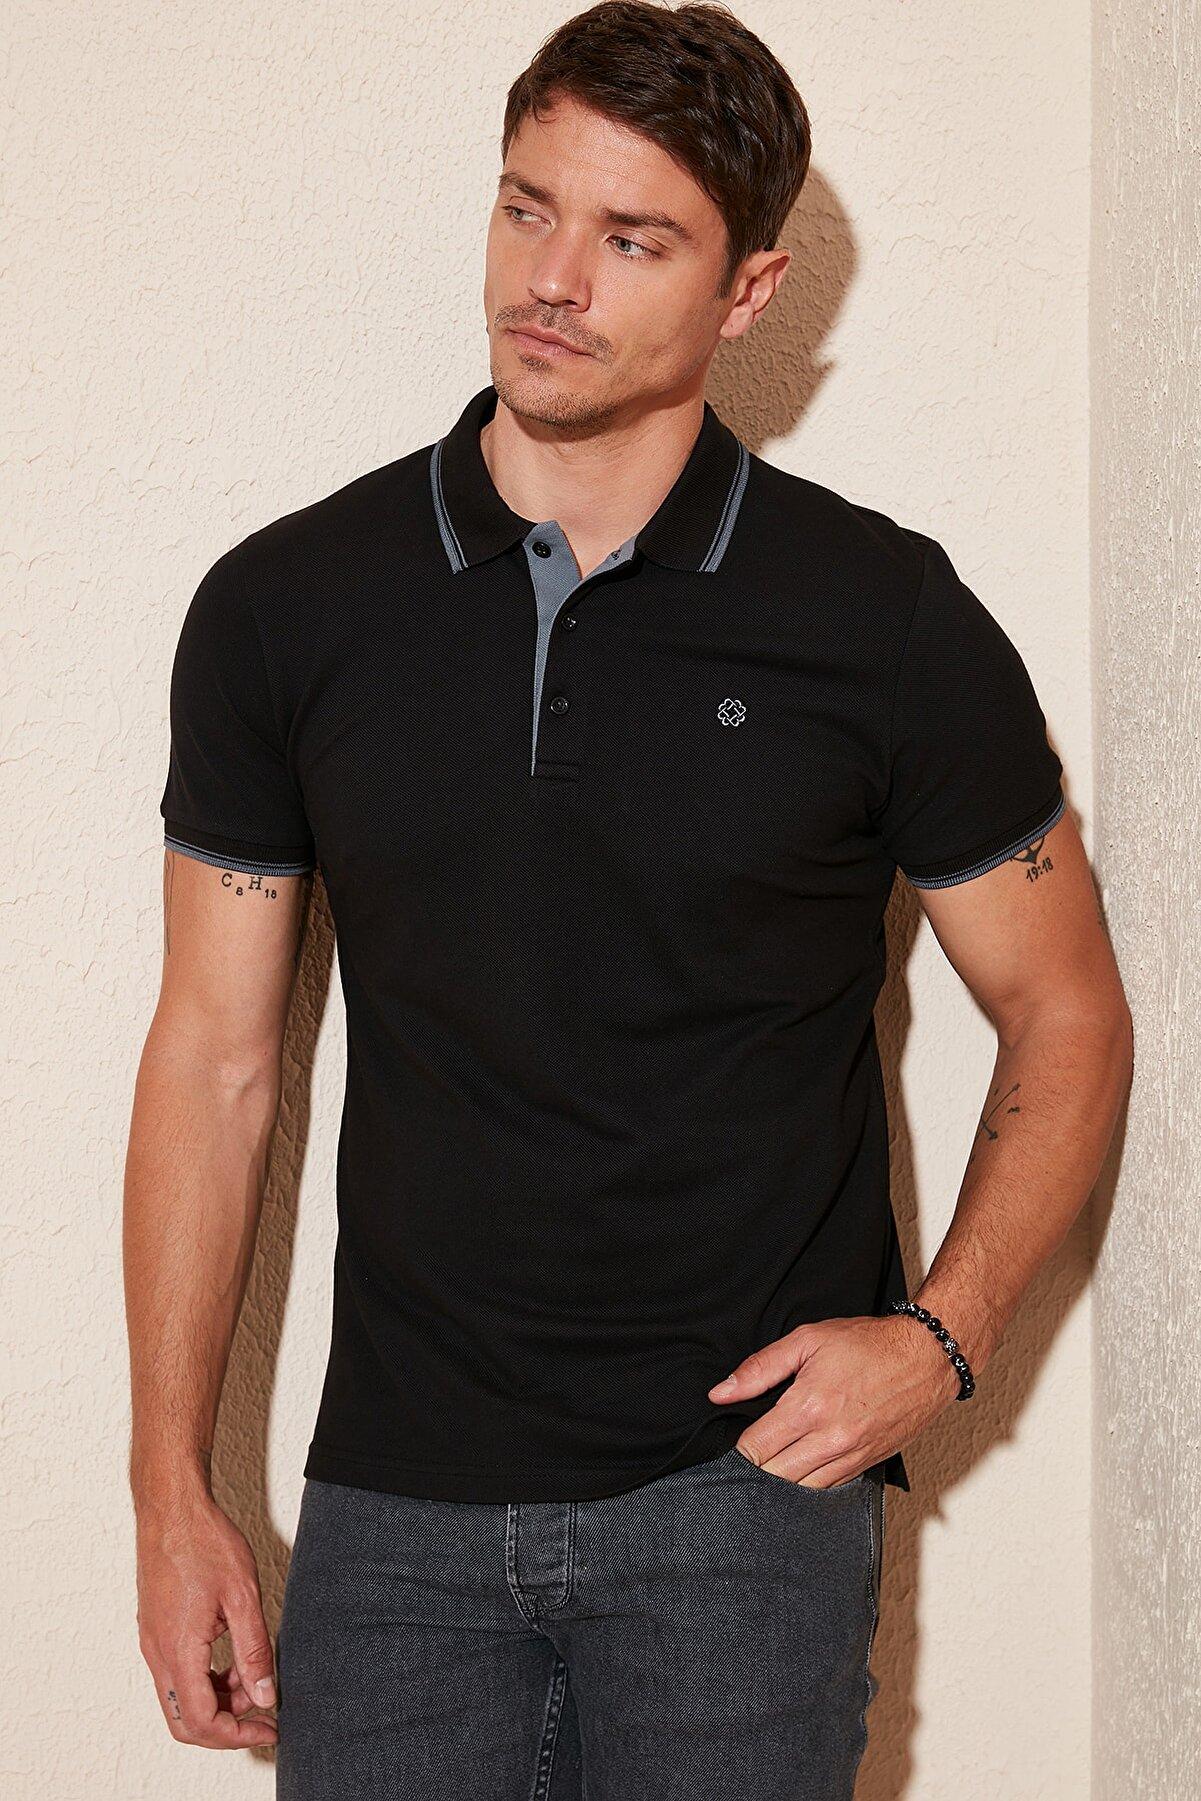 Buratti % 100 Pamuk Düğmeli Polo T Shirt Erkek Polo 5902118